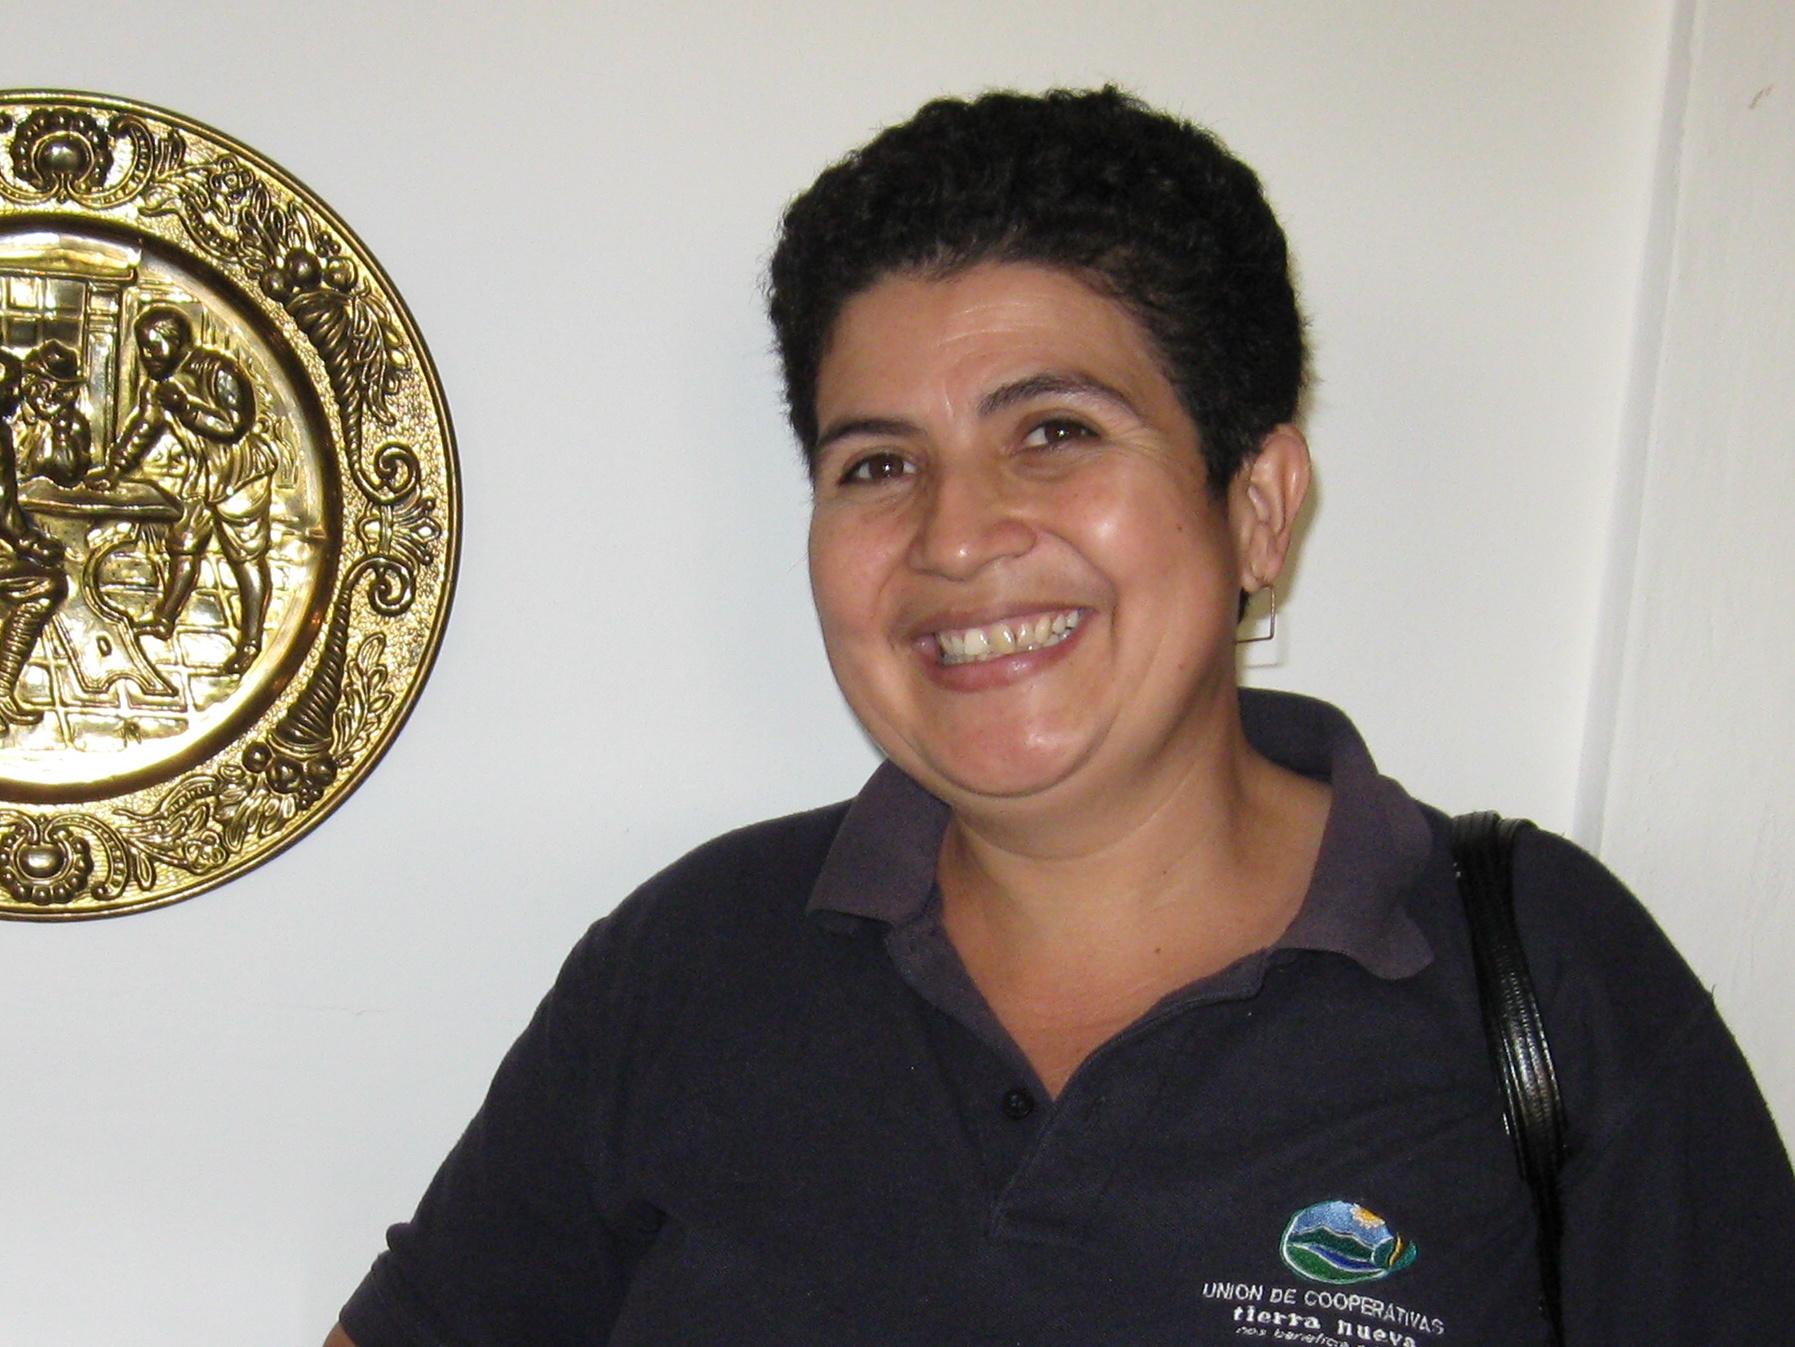 Agueda Ordenana, member of the Tierra Nueva Women's Commission